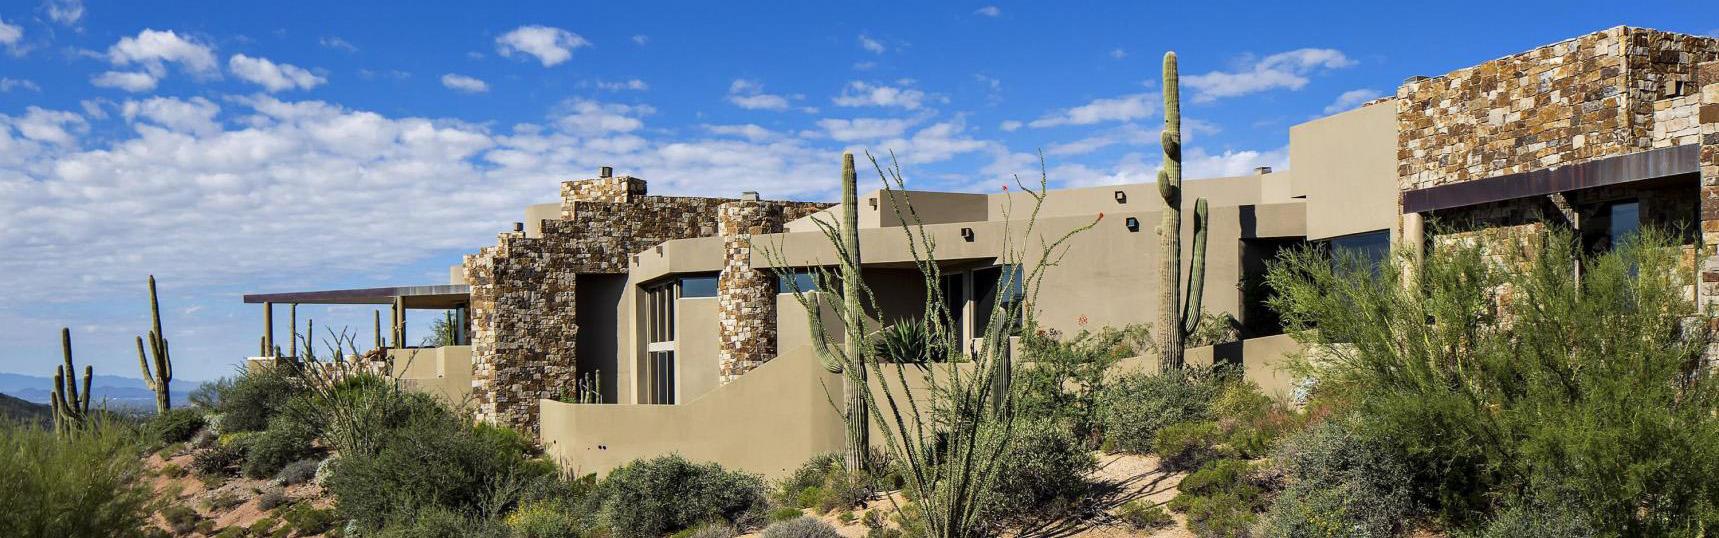 Scottsdale-Pano_Web